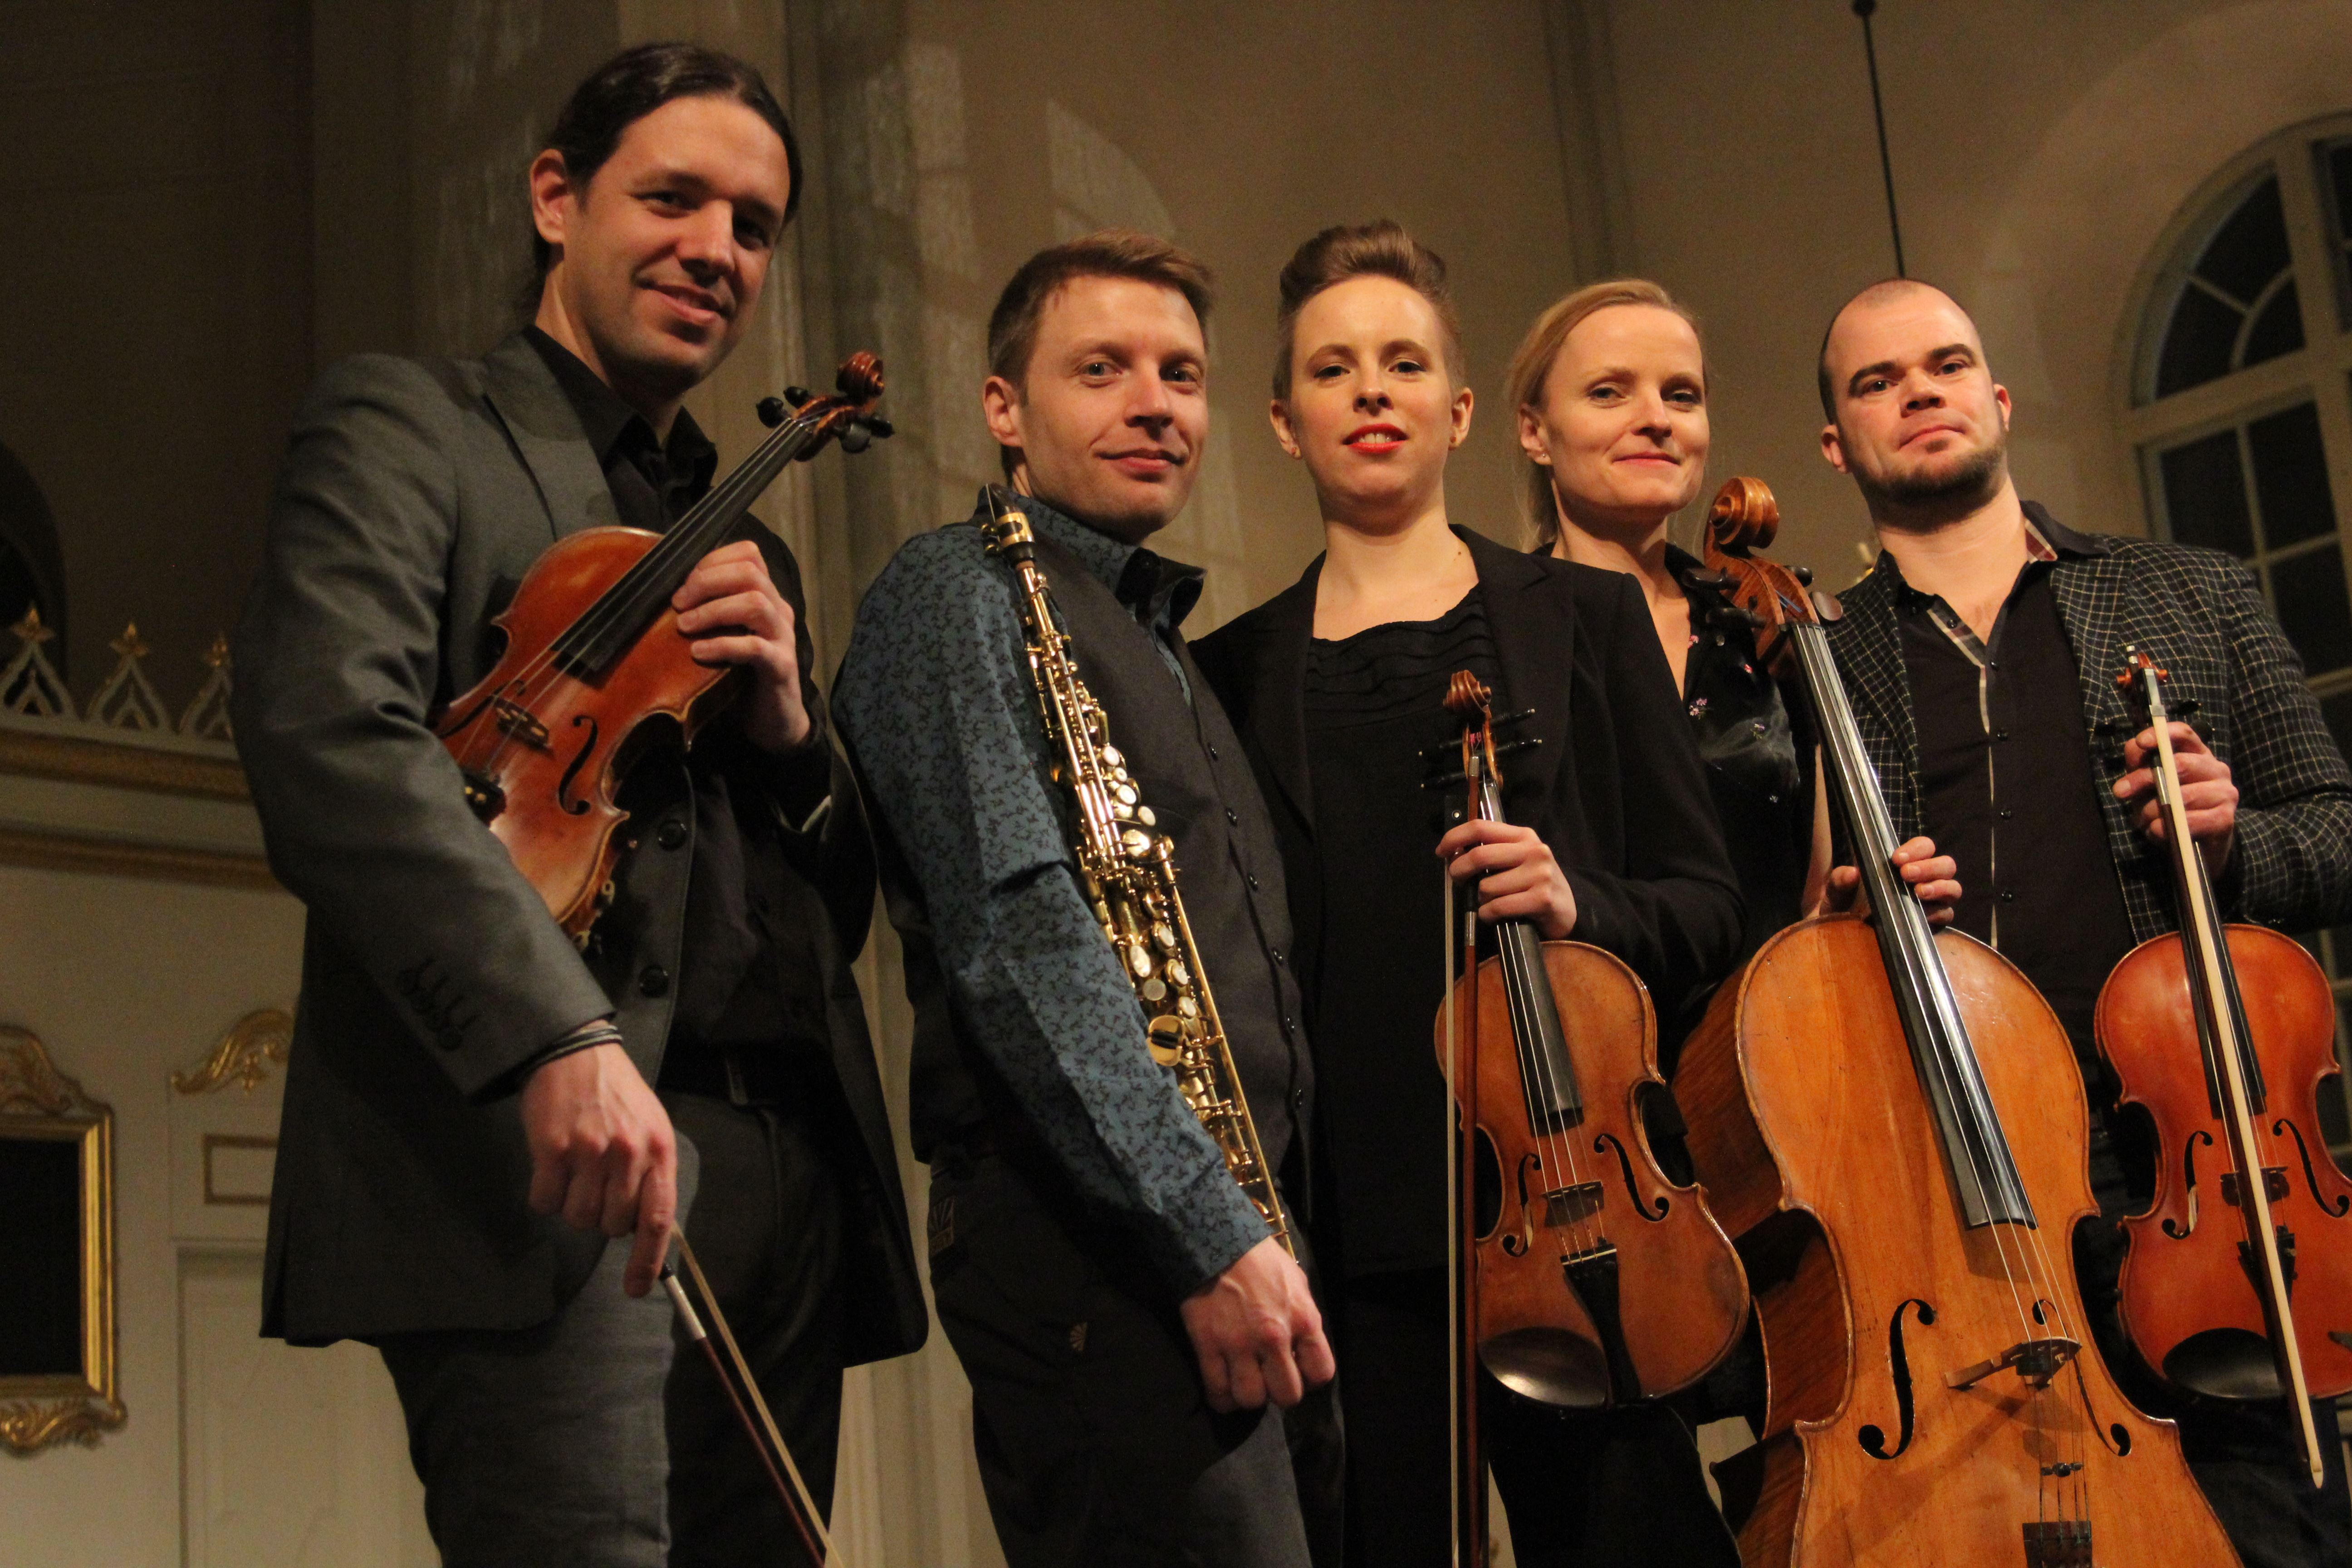 Alm Nils Ersson, Konsert - Nybyggnan